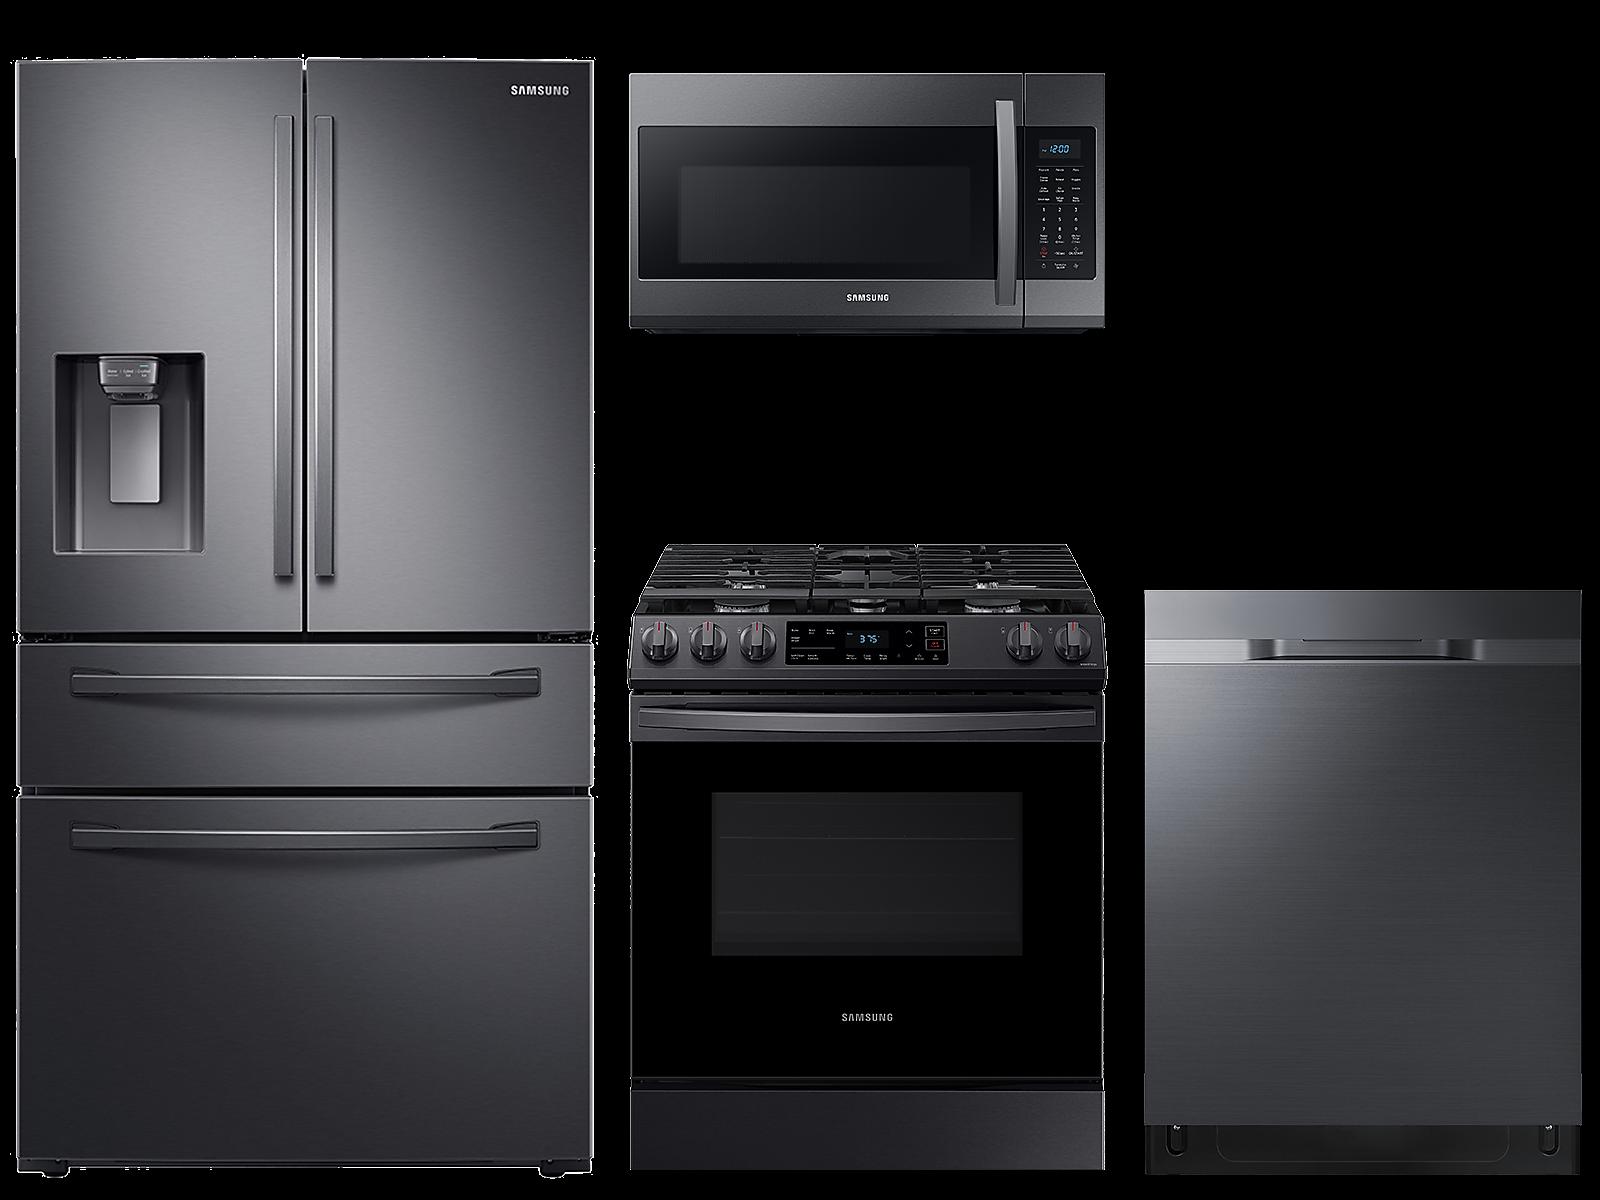 Samsung coupon: Samsung 28 cu. ft. 4-door refrigerator, gas range, microwave and 48 dBA dishwasher package(BNDL-1614026233832)